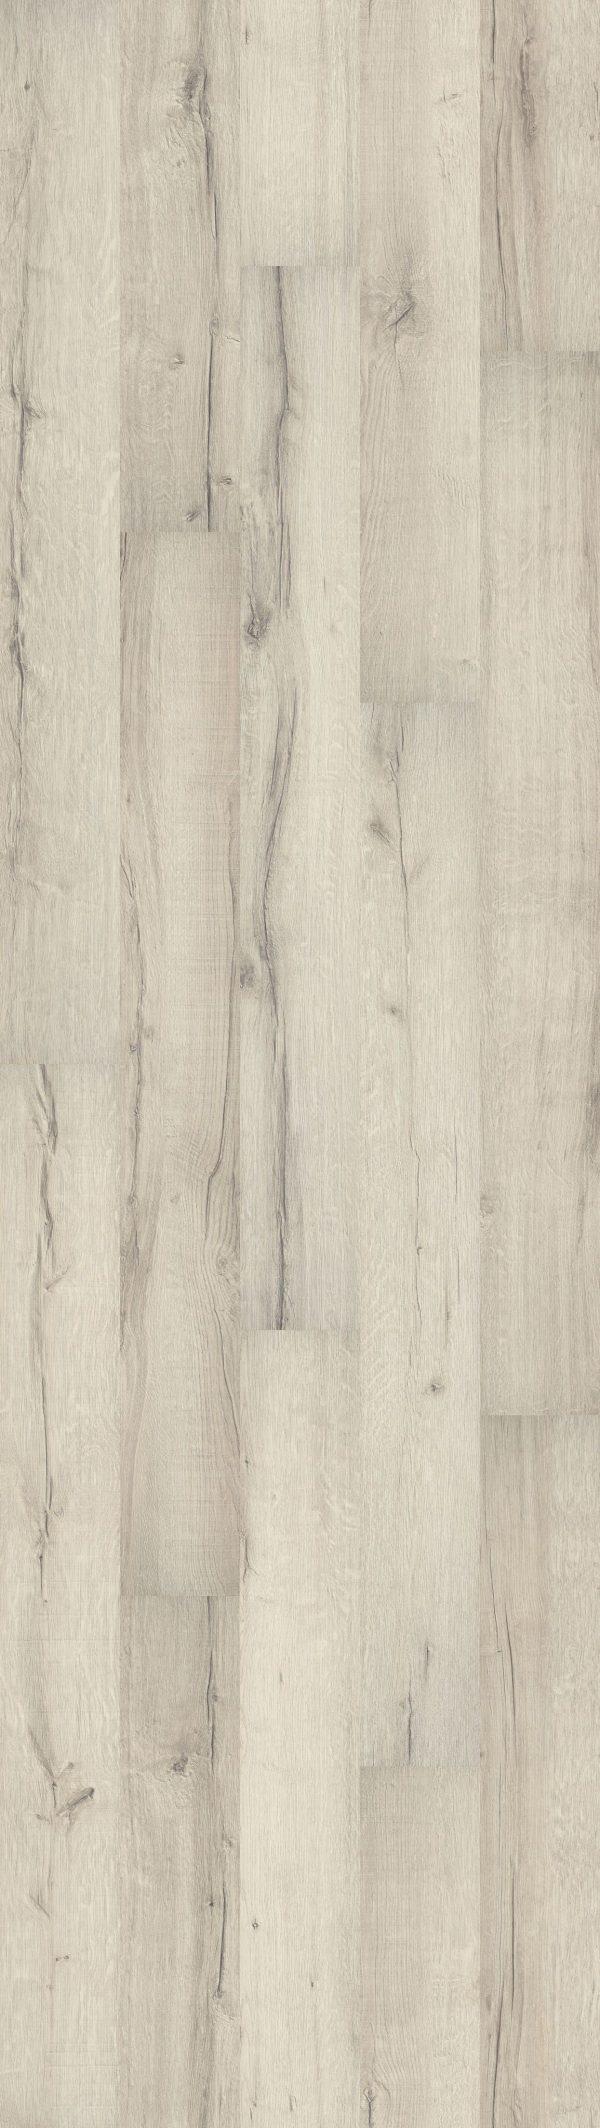 Tirol Oak White